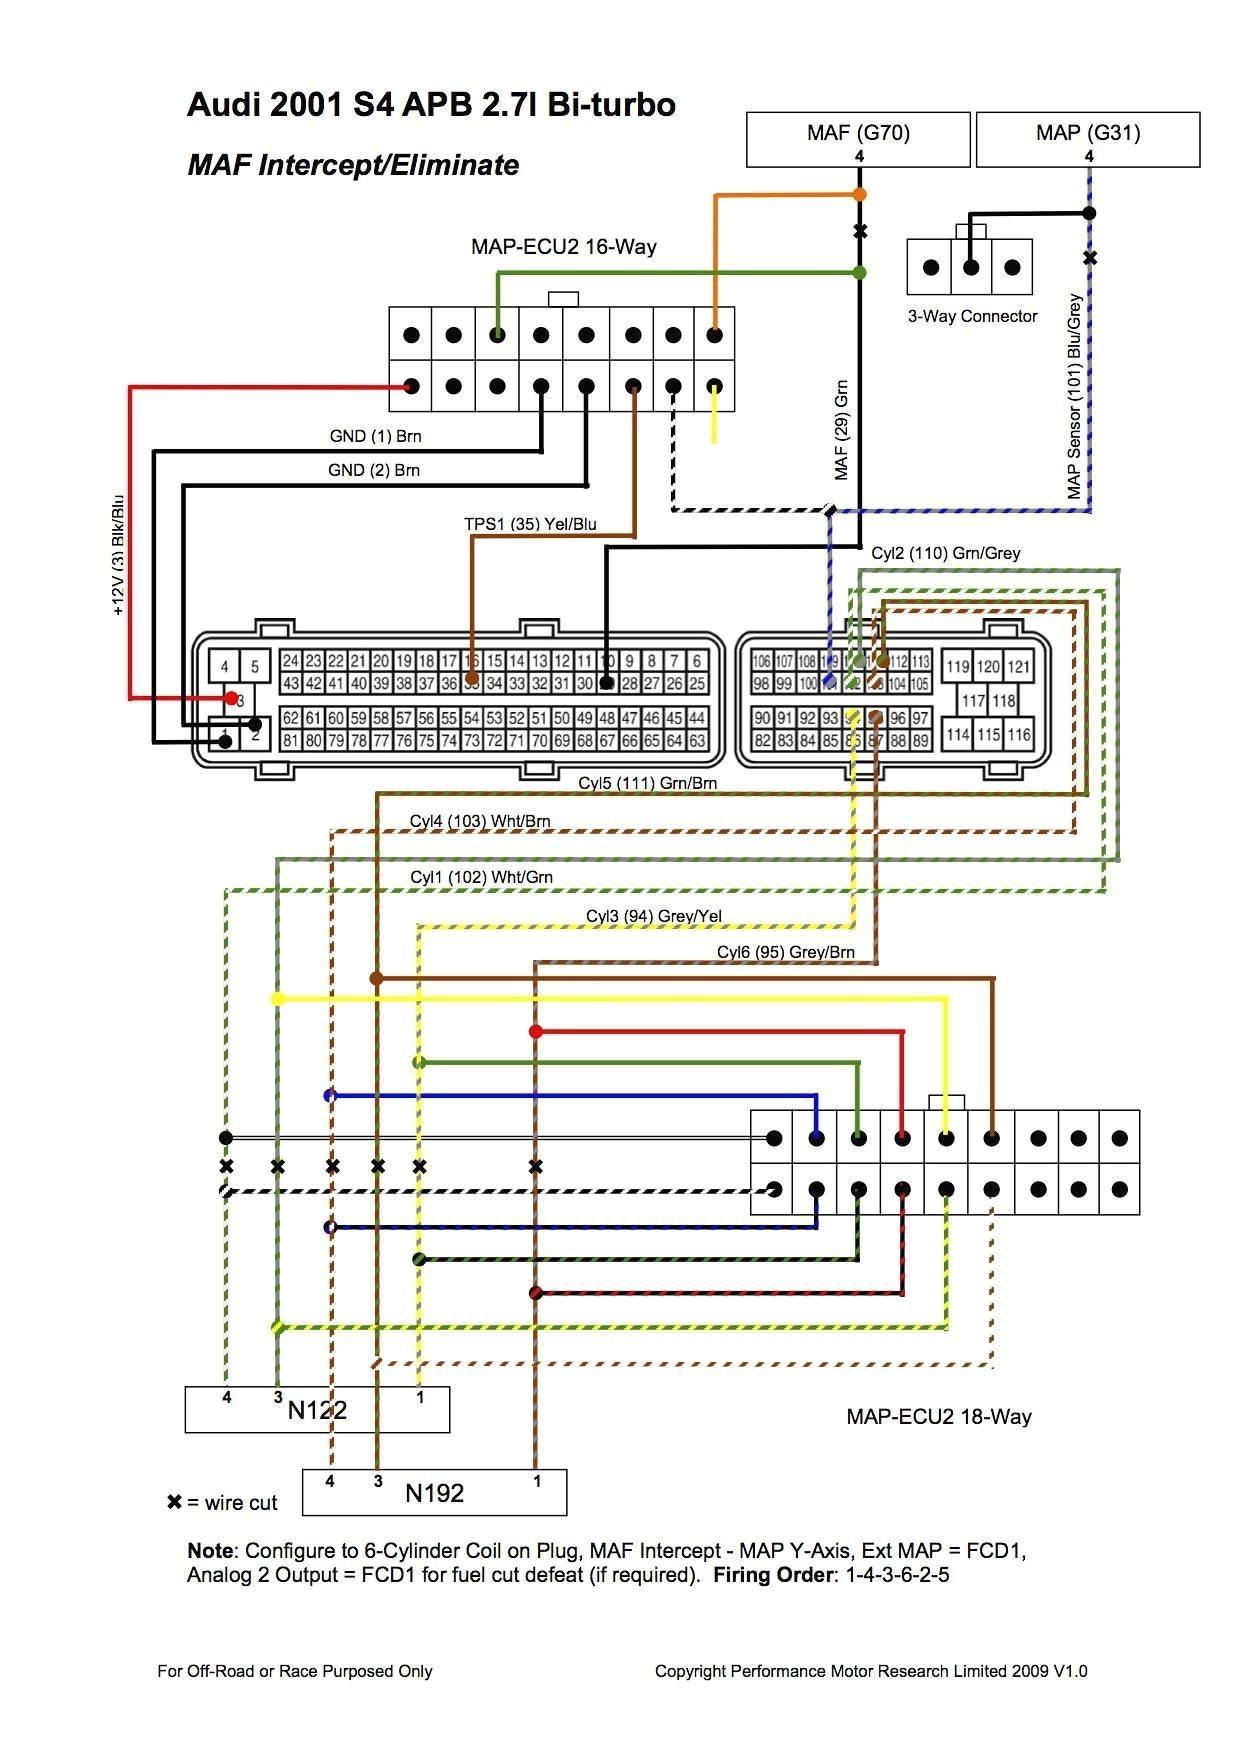 dodge dakota transmission wiring harness wiring diagrams konsult diagram further chevy silverado wire harness on 2000 dodge durango